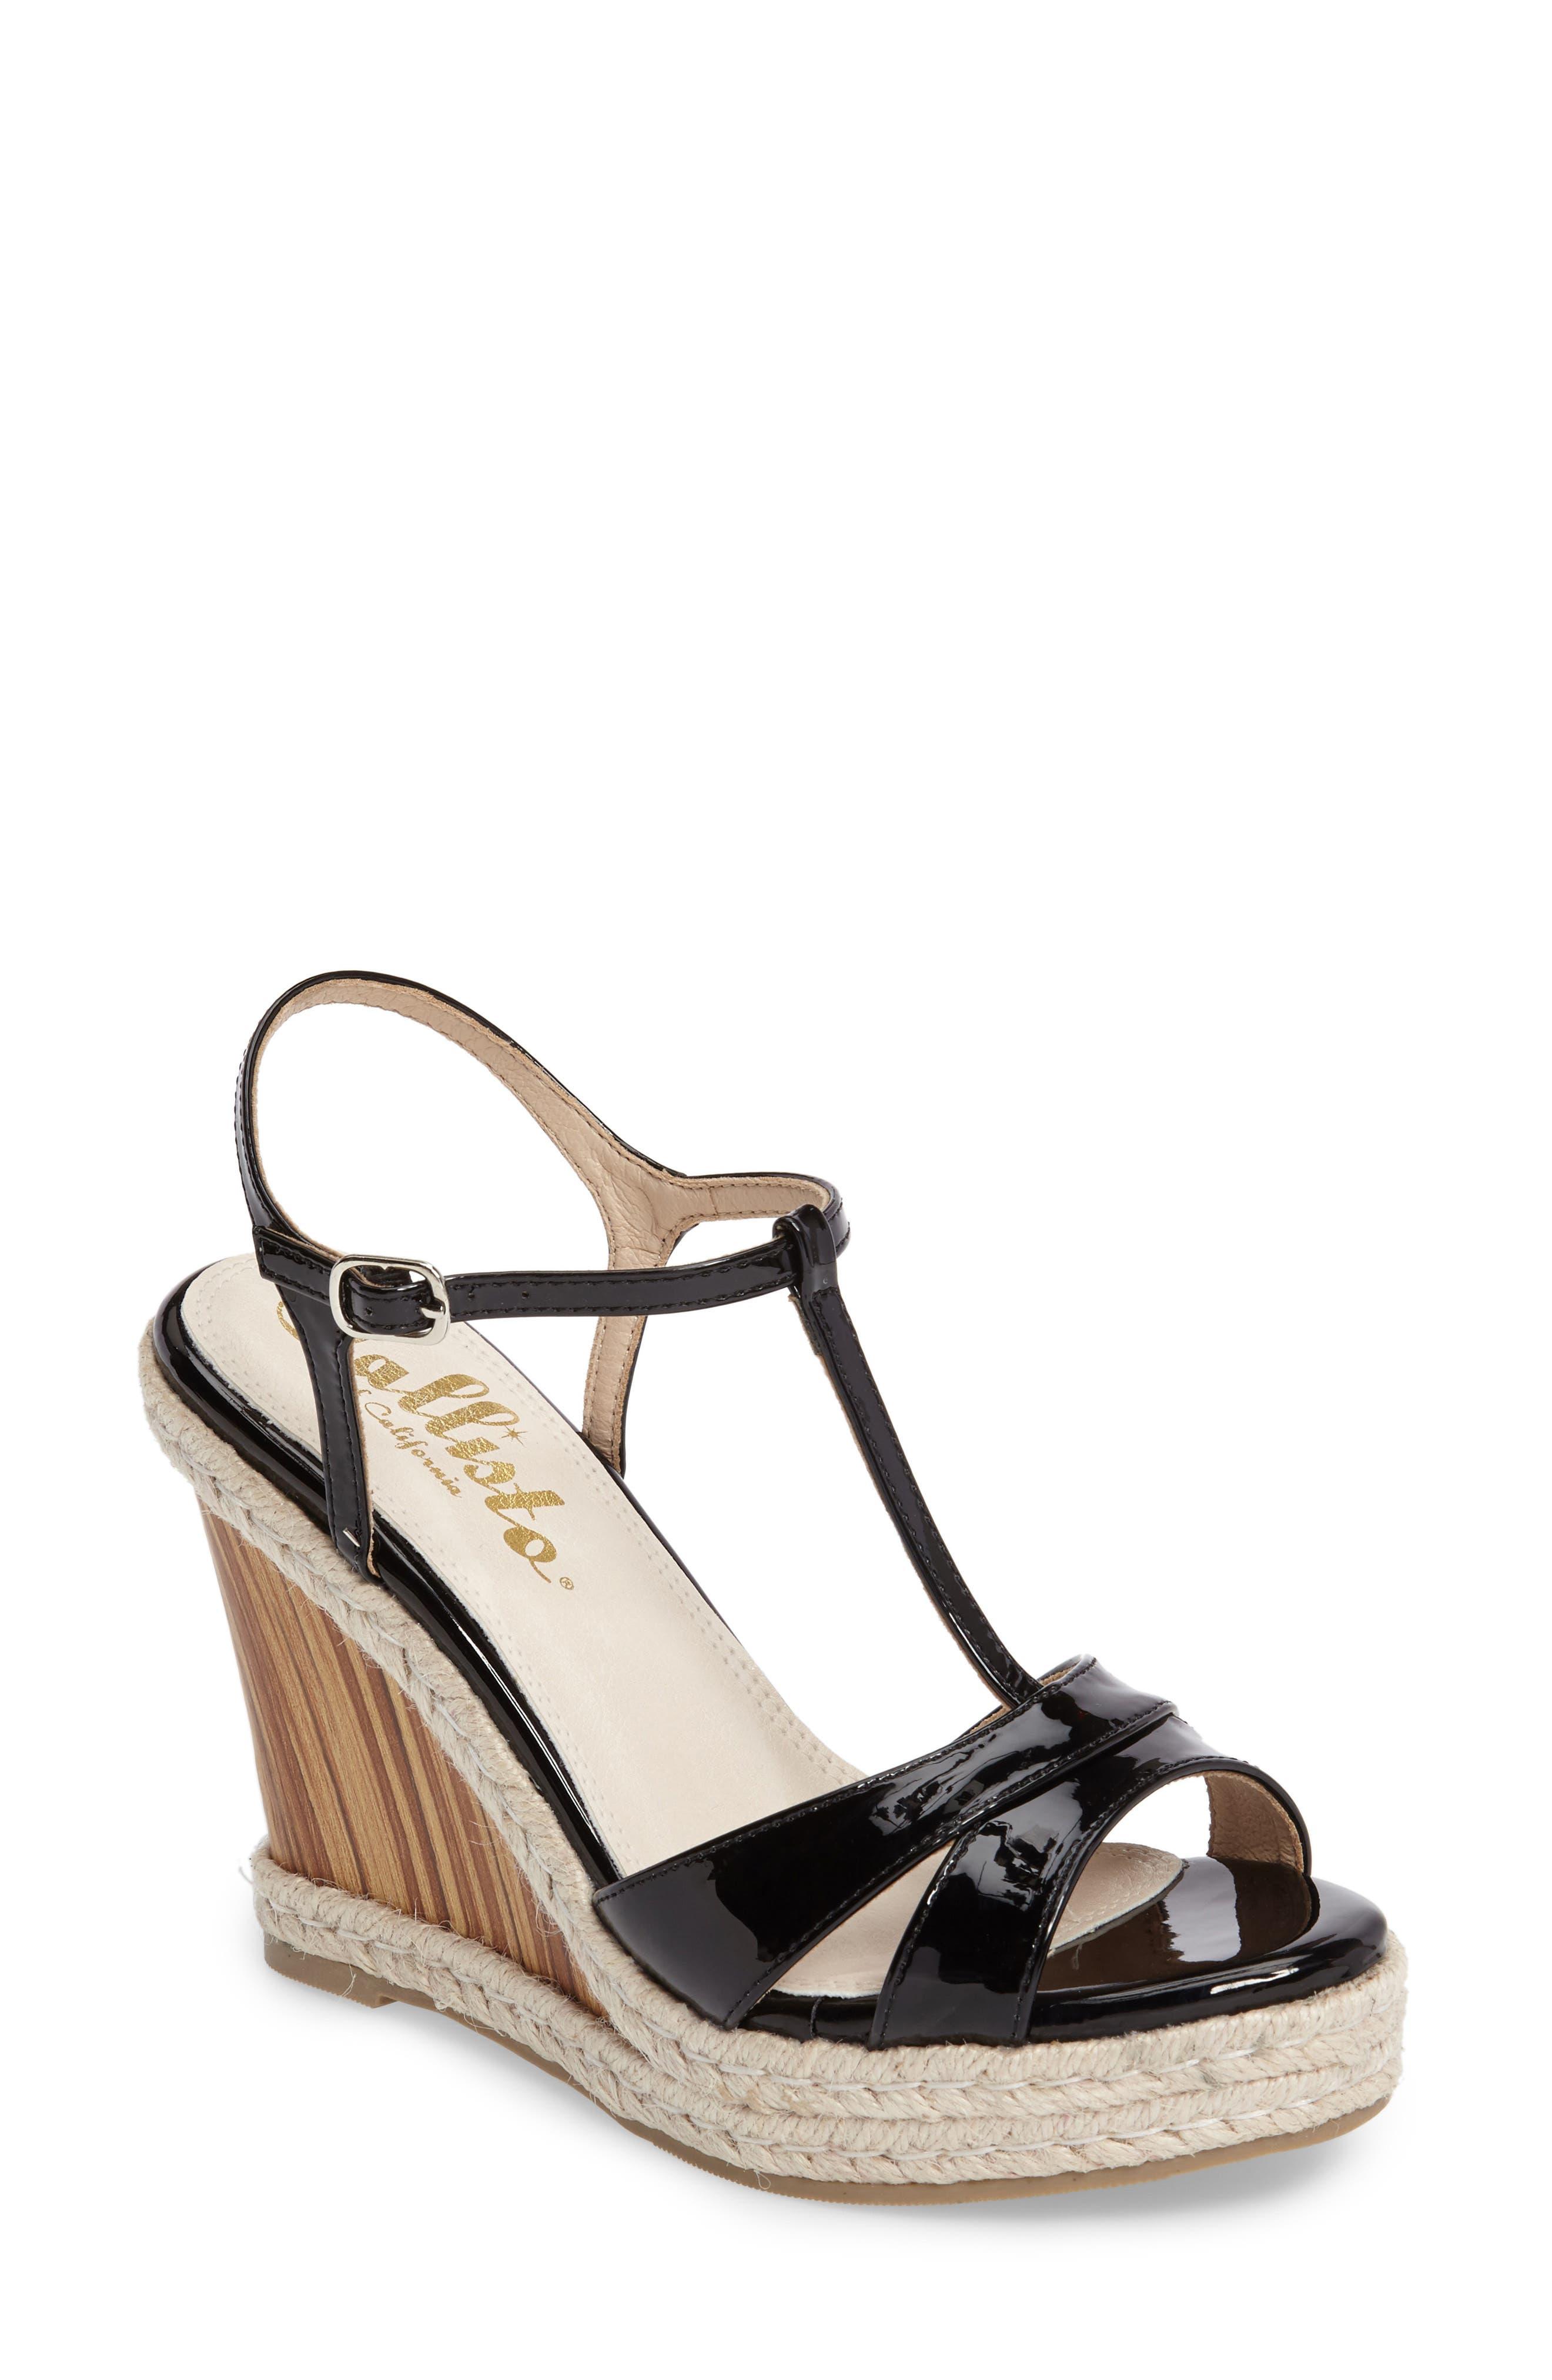 Alinna T-Strap Wedge Sandal,                             Main thumbnail 1, color,                             002